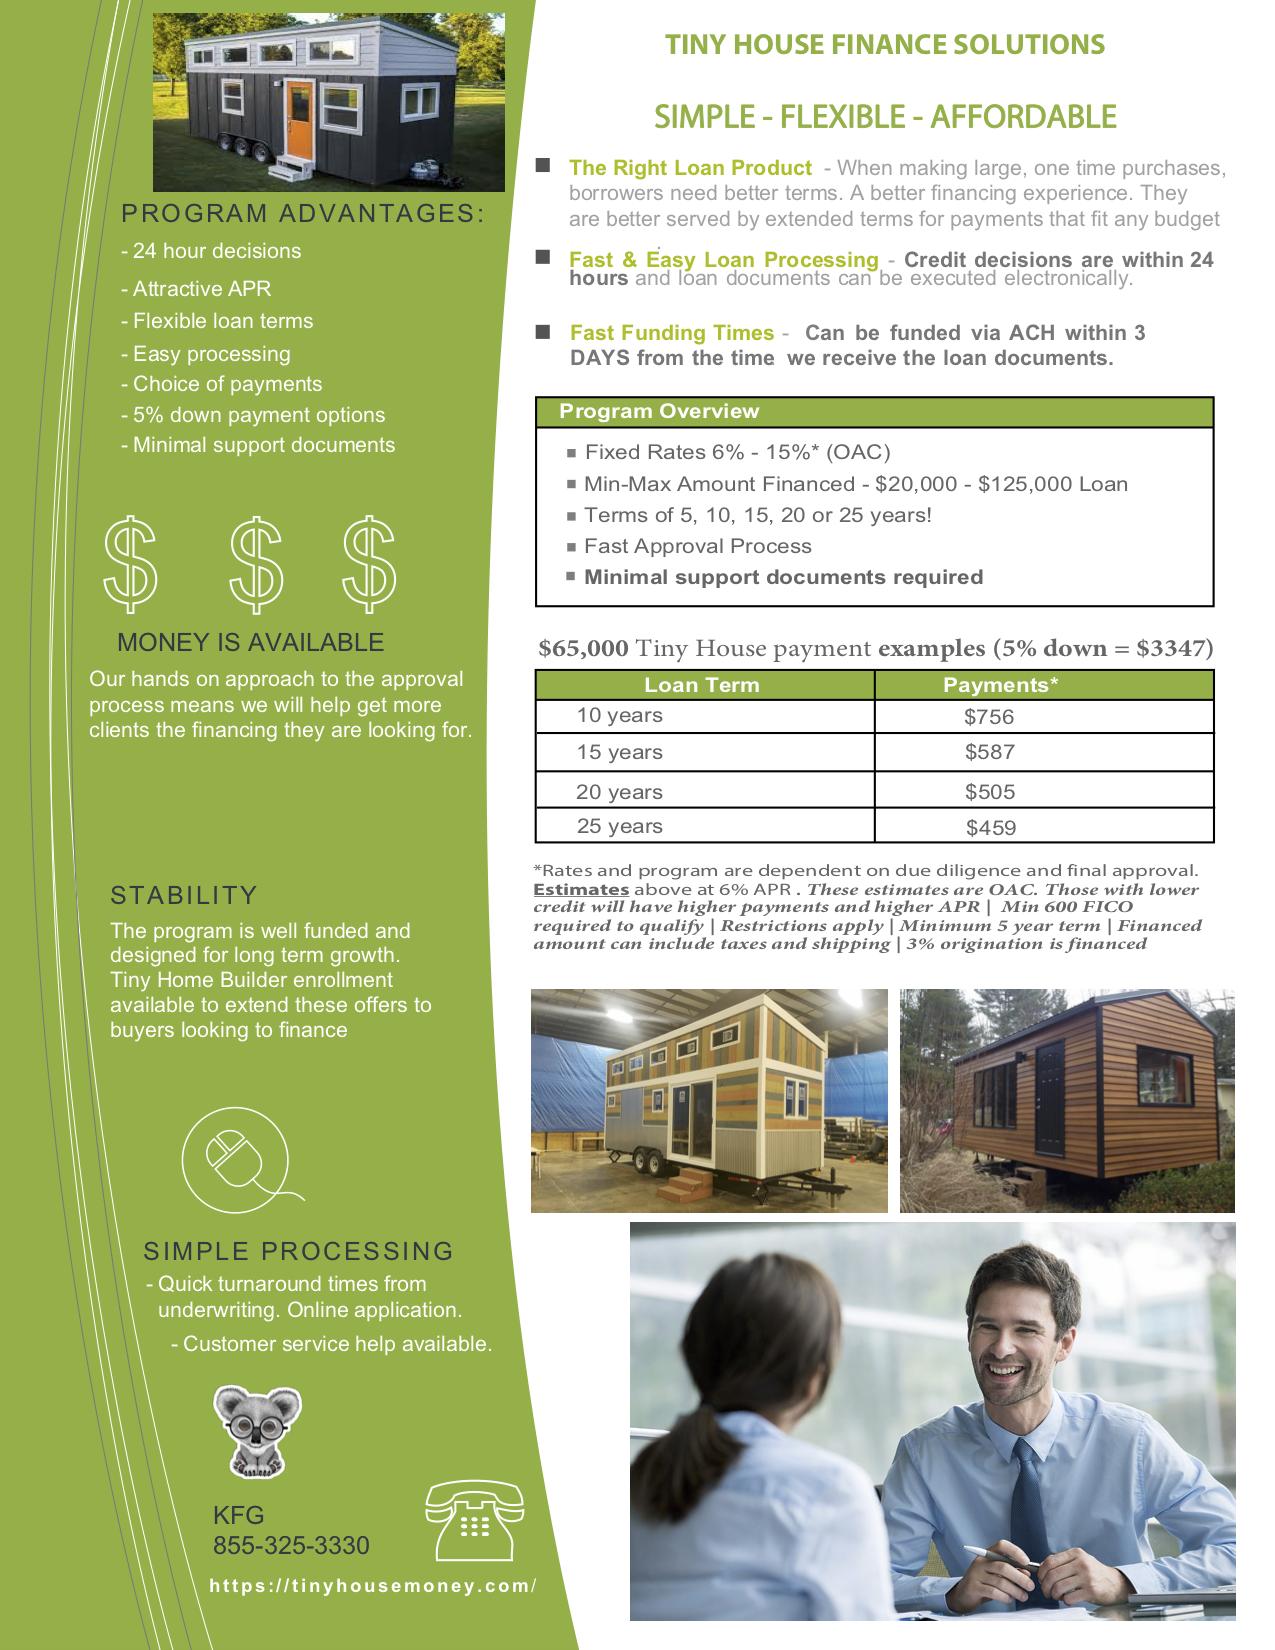 Tiny House Program Flyer-KFG 1.png